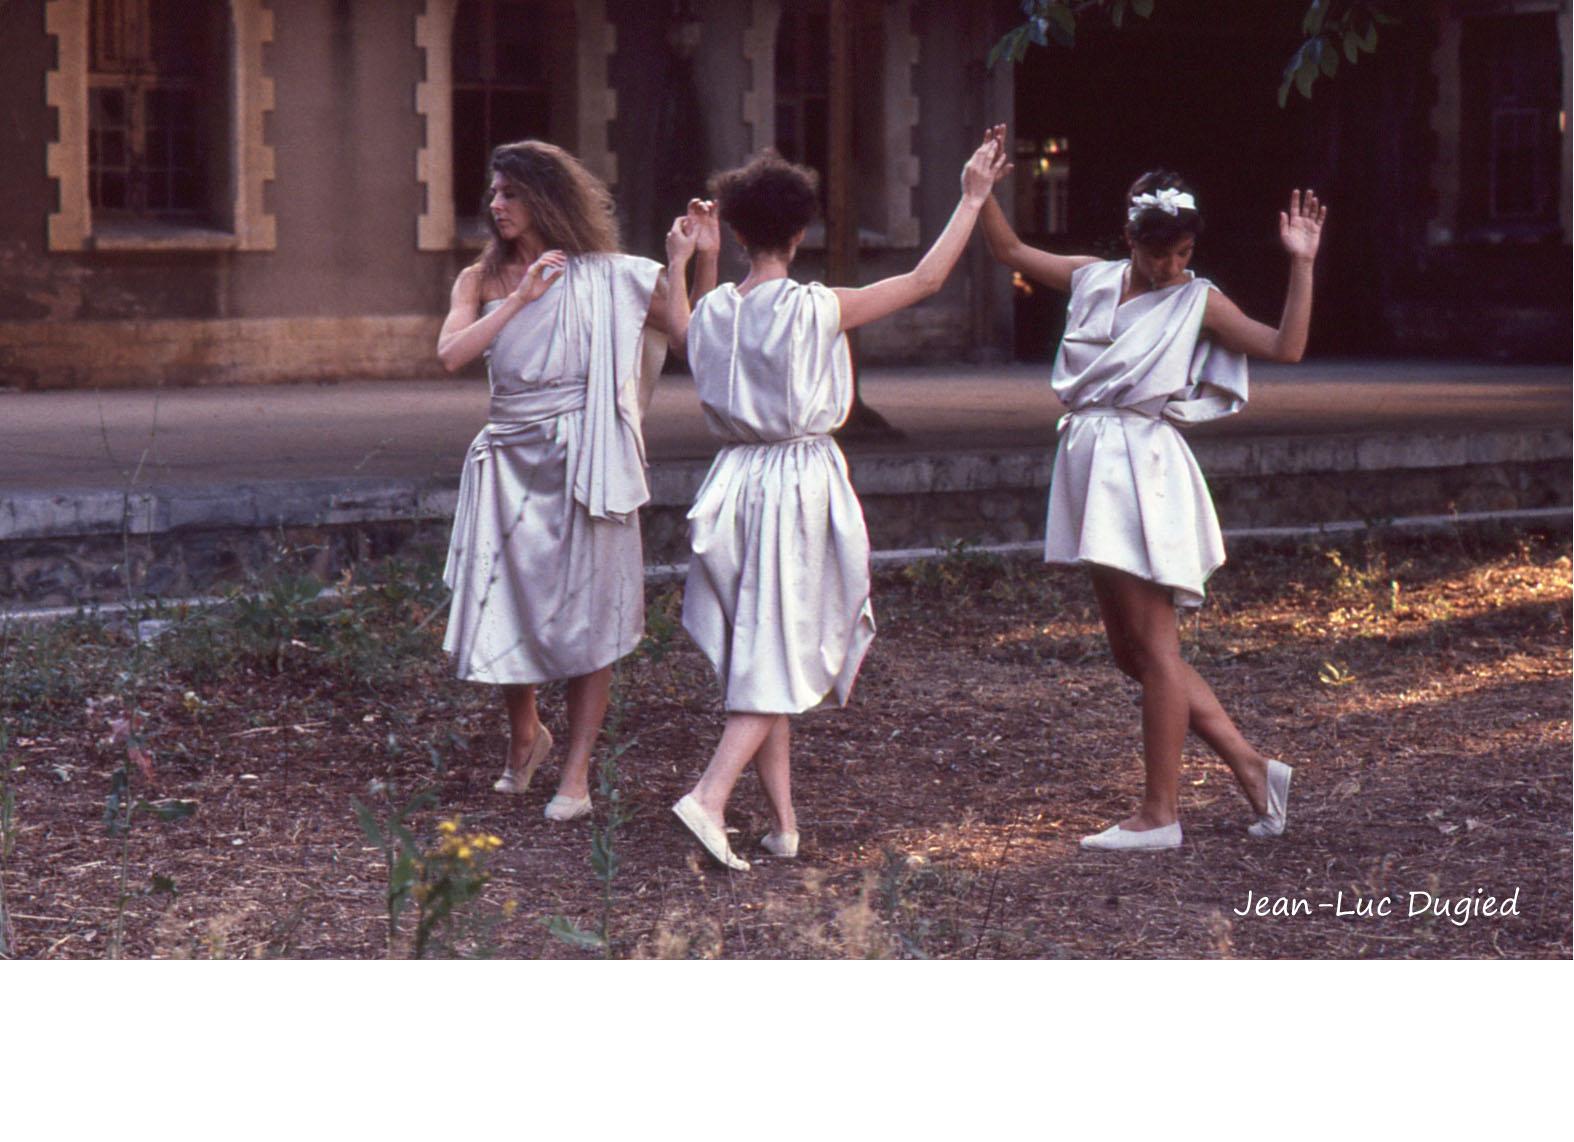 30 Duboc Odile - nuit hexoise - Aix - 1986